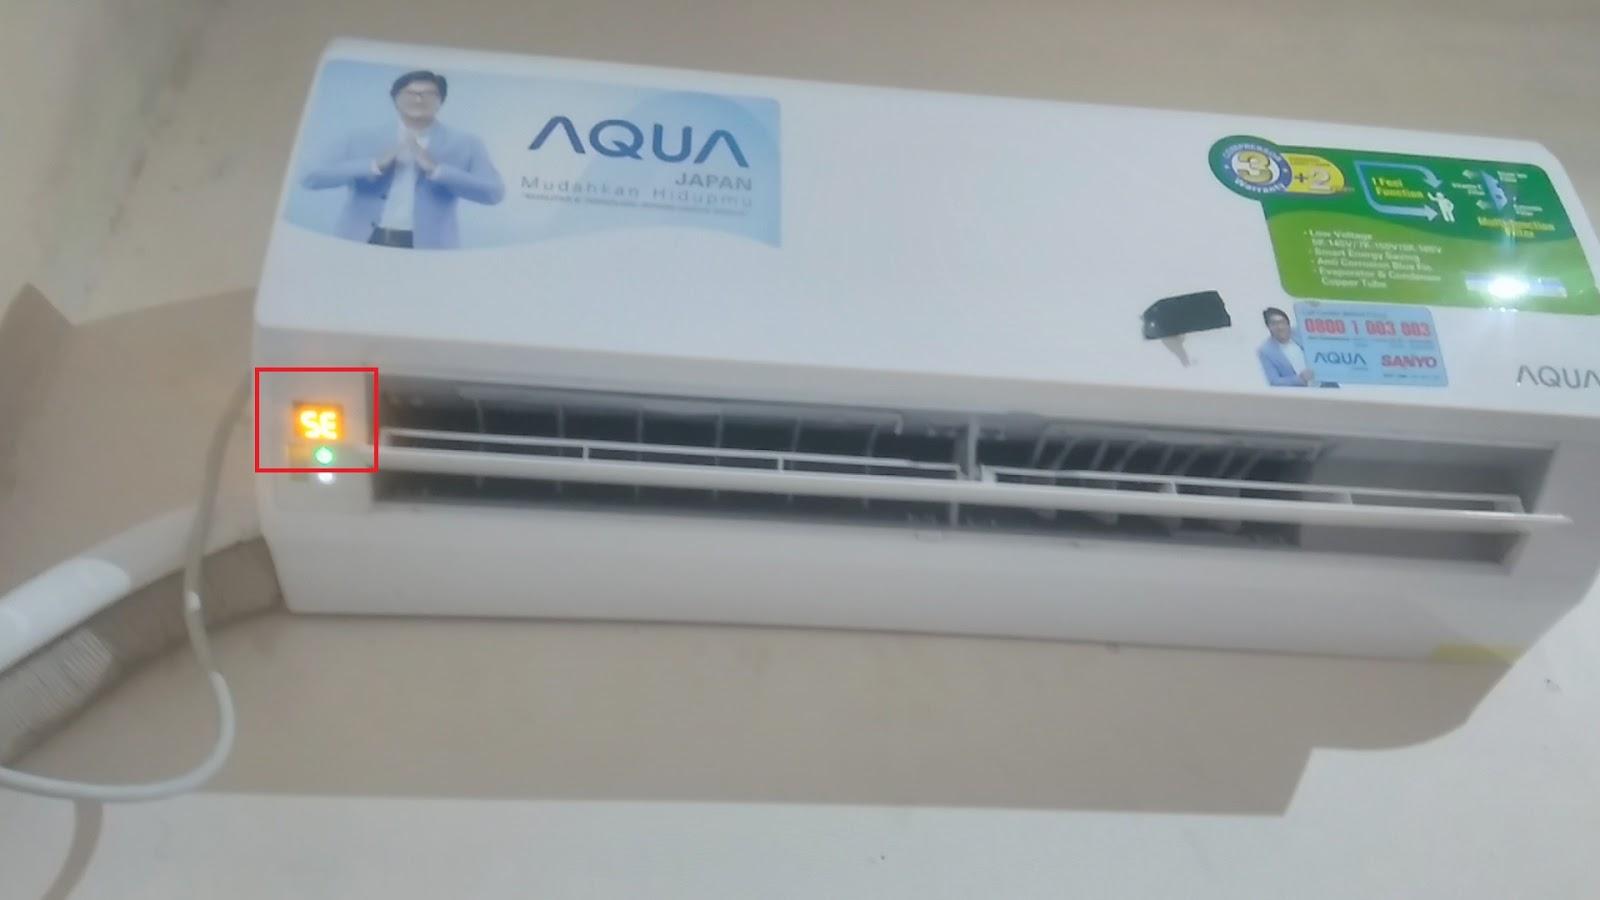 Cara Agar Ac Aqua Japan Hemat Listrik - Dibacaonline